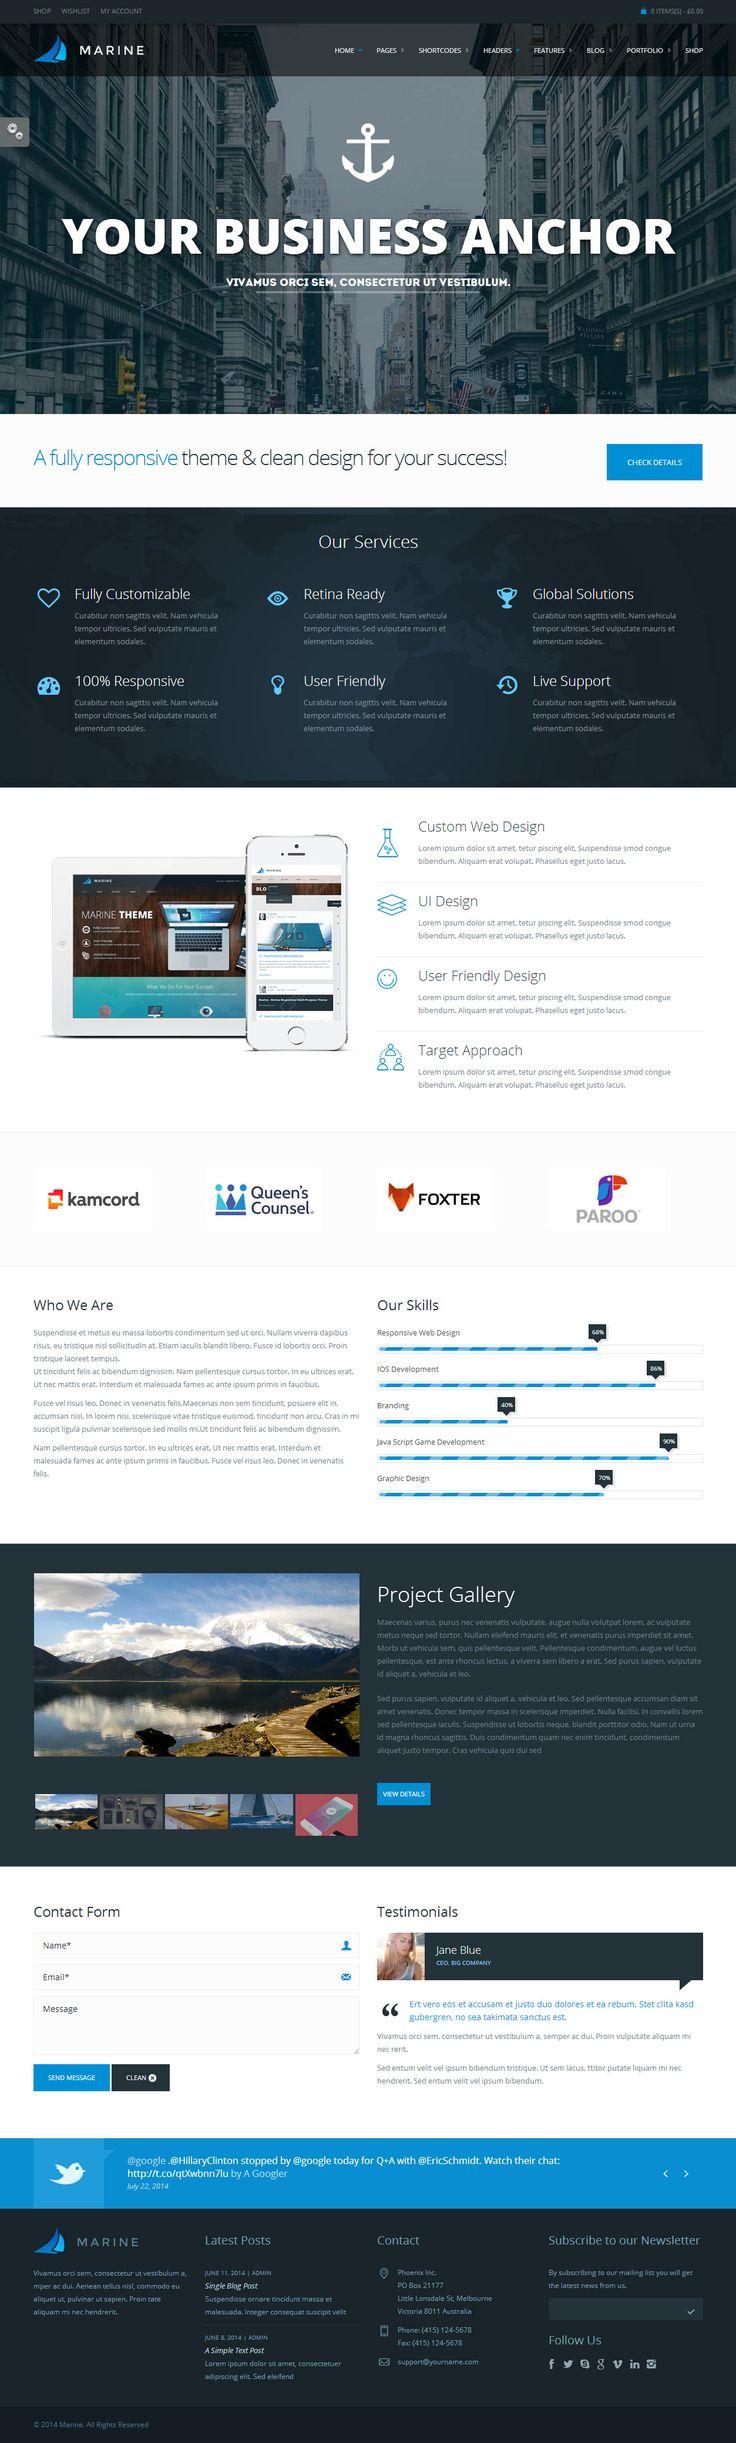 Marine is Premium full Responsive WordPress Multipurpose theme. WooCommerce. Parallax Scrolling. Retina Ready. Google Map. http://www.responsivemiracle.com/cms/marine-premium-responsive-multipurpose-worpress-theme/